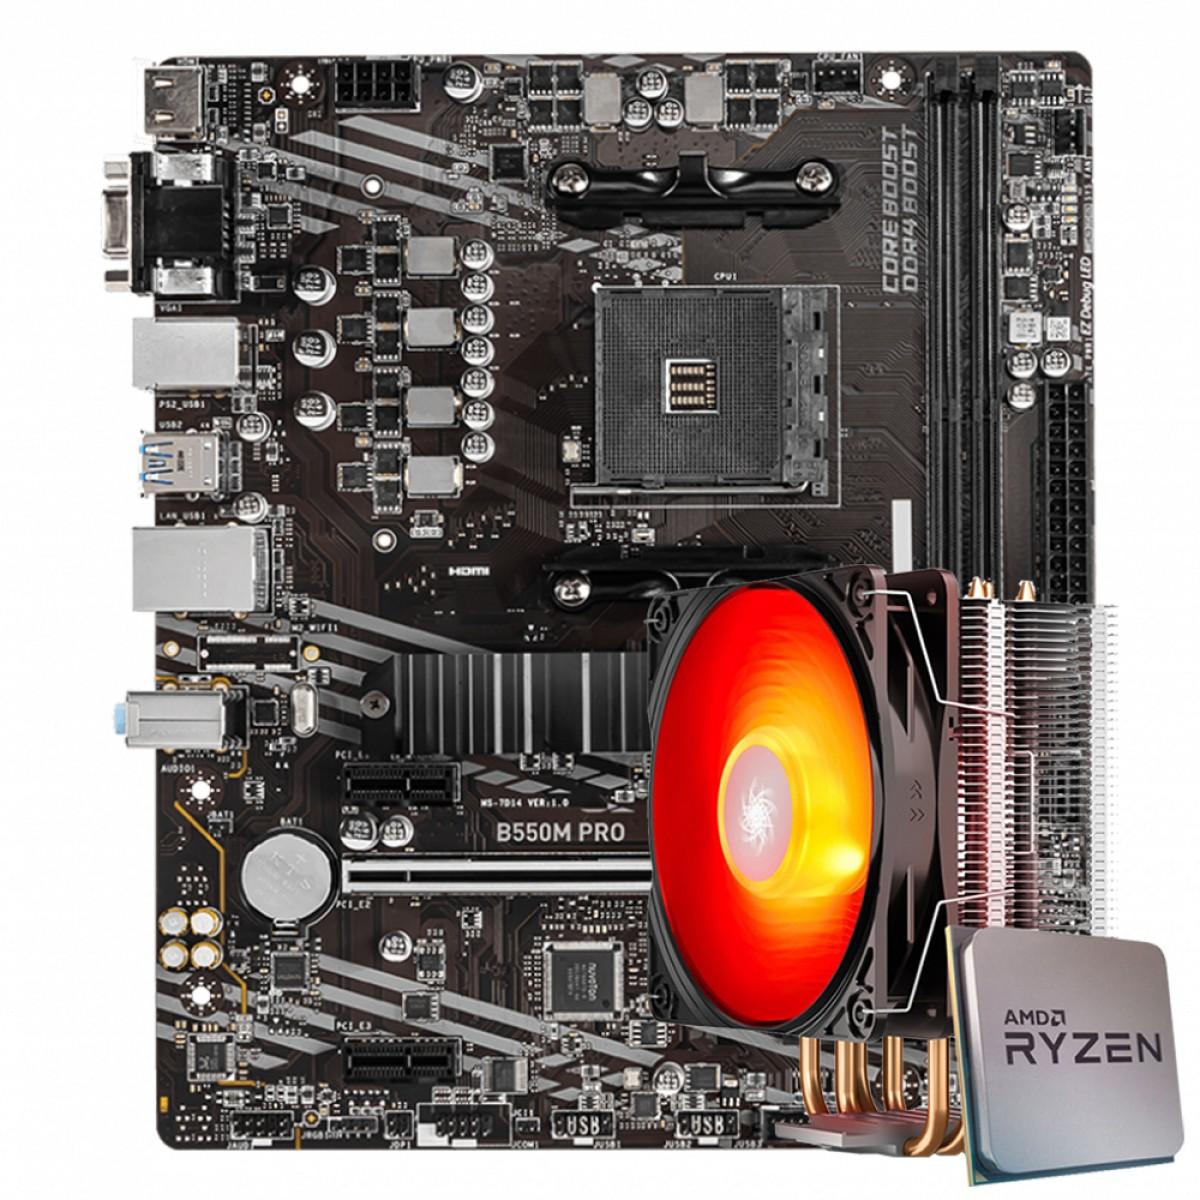 Kit Upgrade MSI B550M PRO + AMD Ryzen 5 5600X 4.6GHz + Deepcool Gammaxx 400 V2 Red